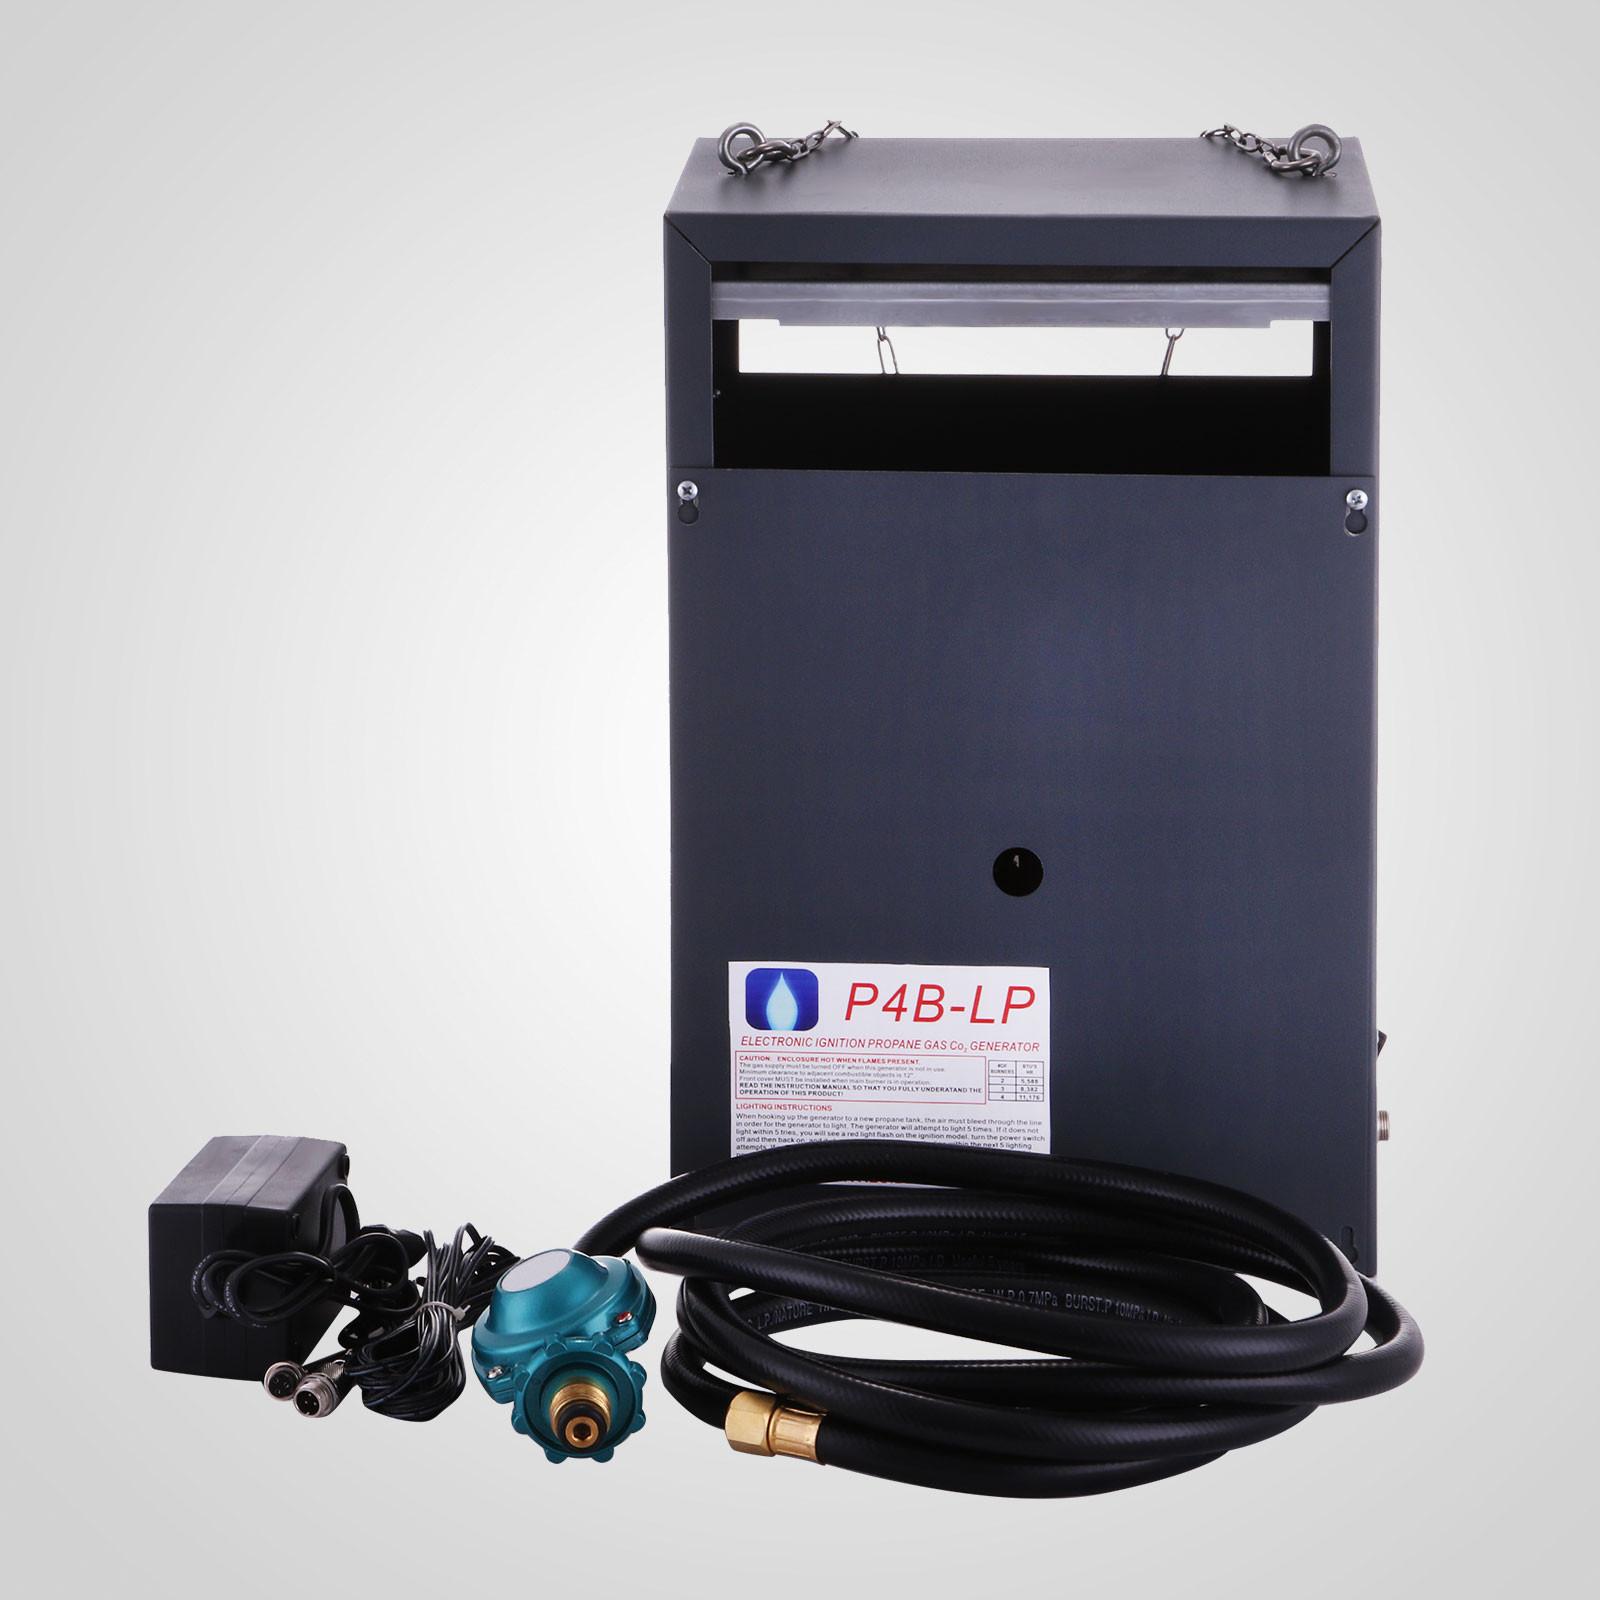 New Hydroponic CO2 Generator 4 Burner Auto Piloting LP Gas